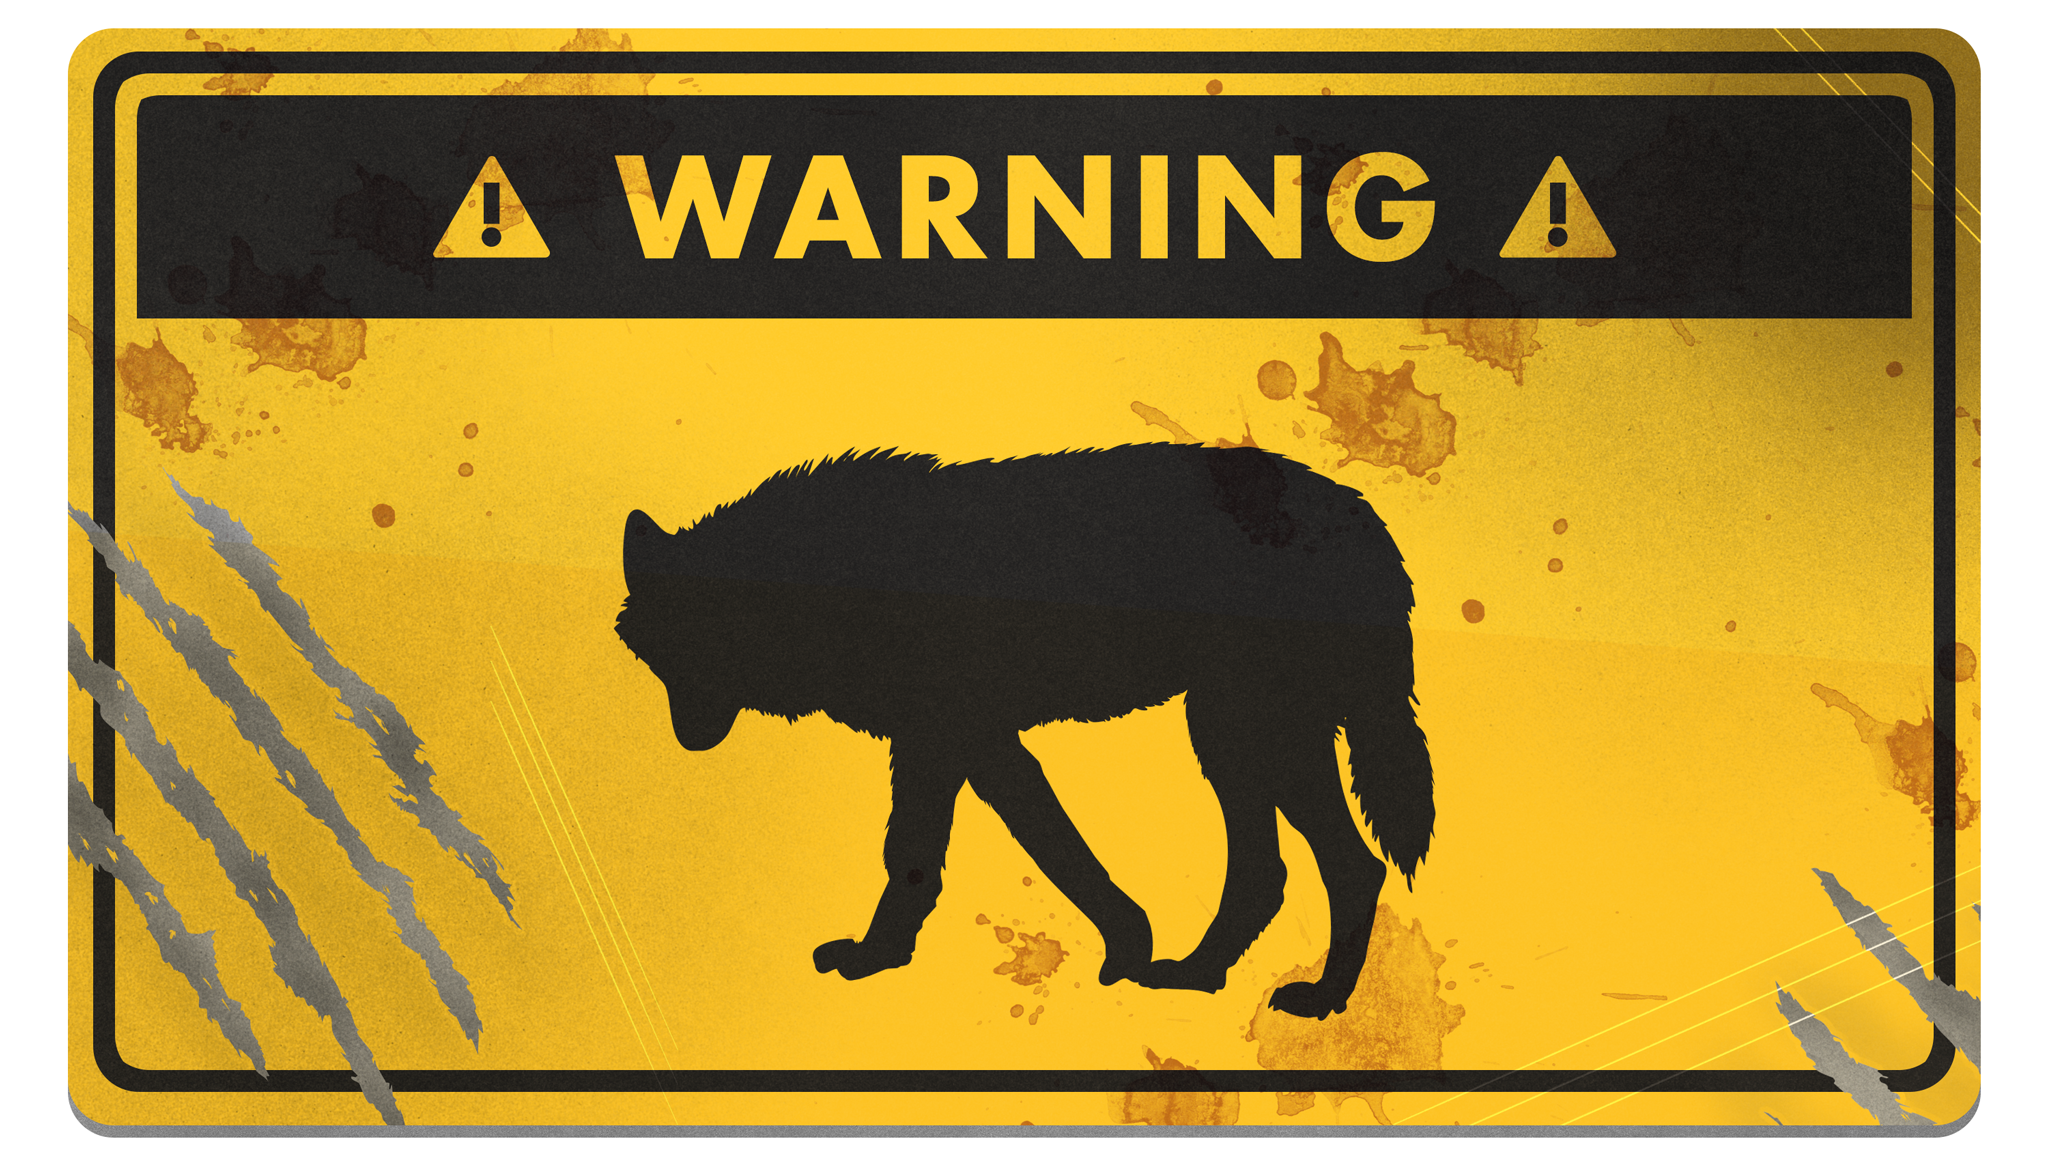 animal-attacks animals camping hiking outdoors survival-skills wild-animals wolves